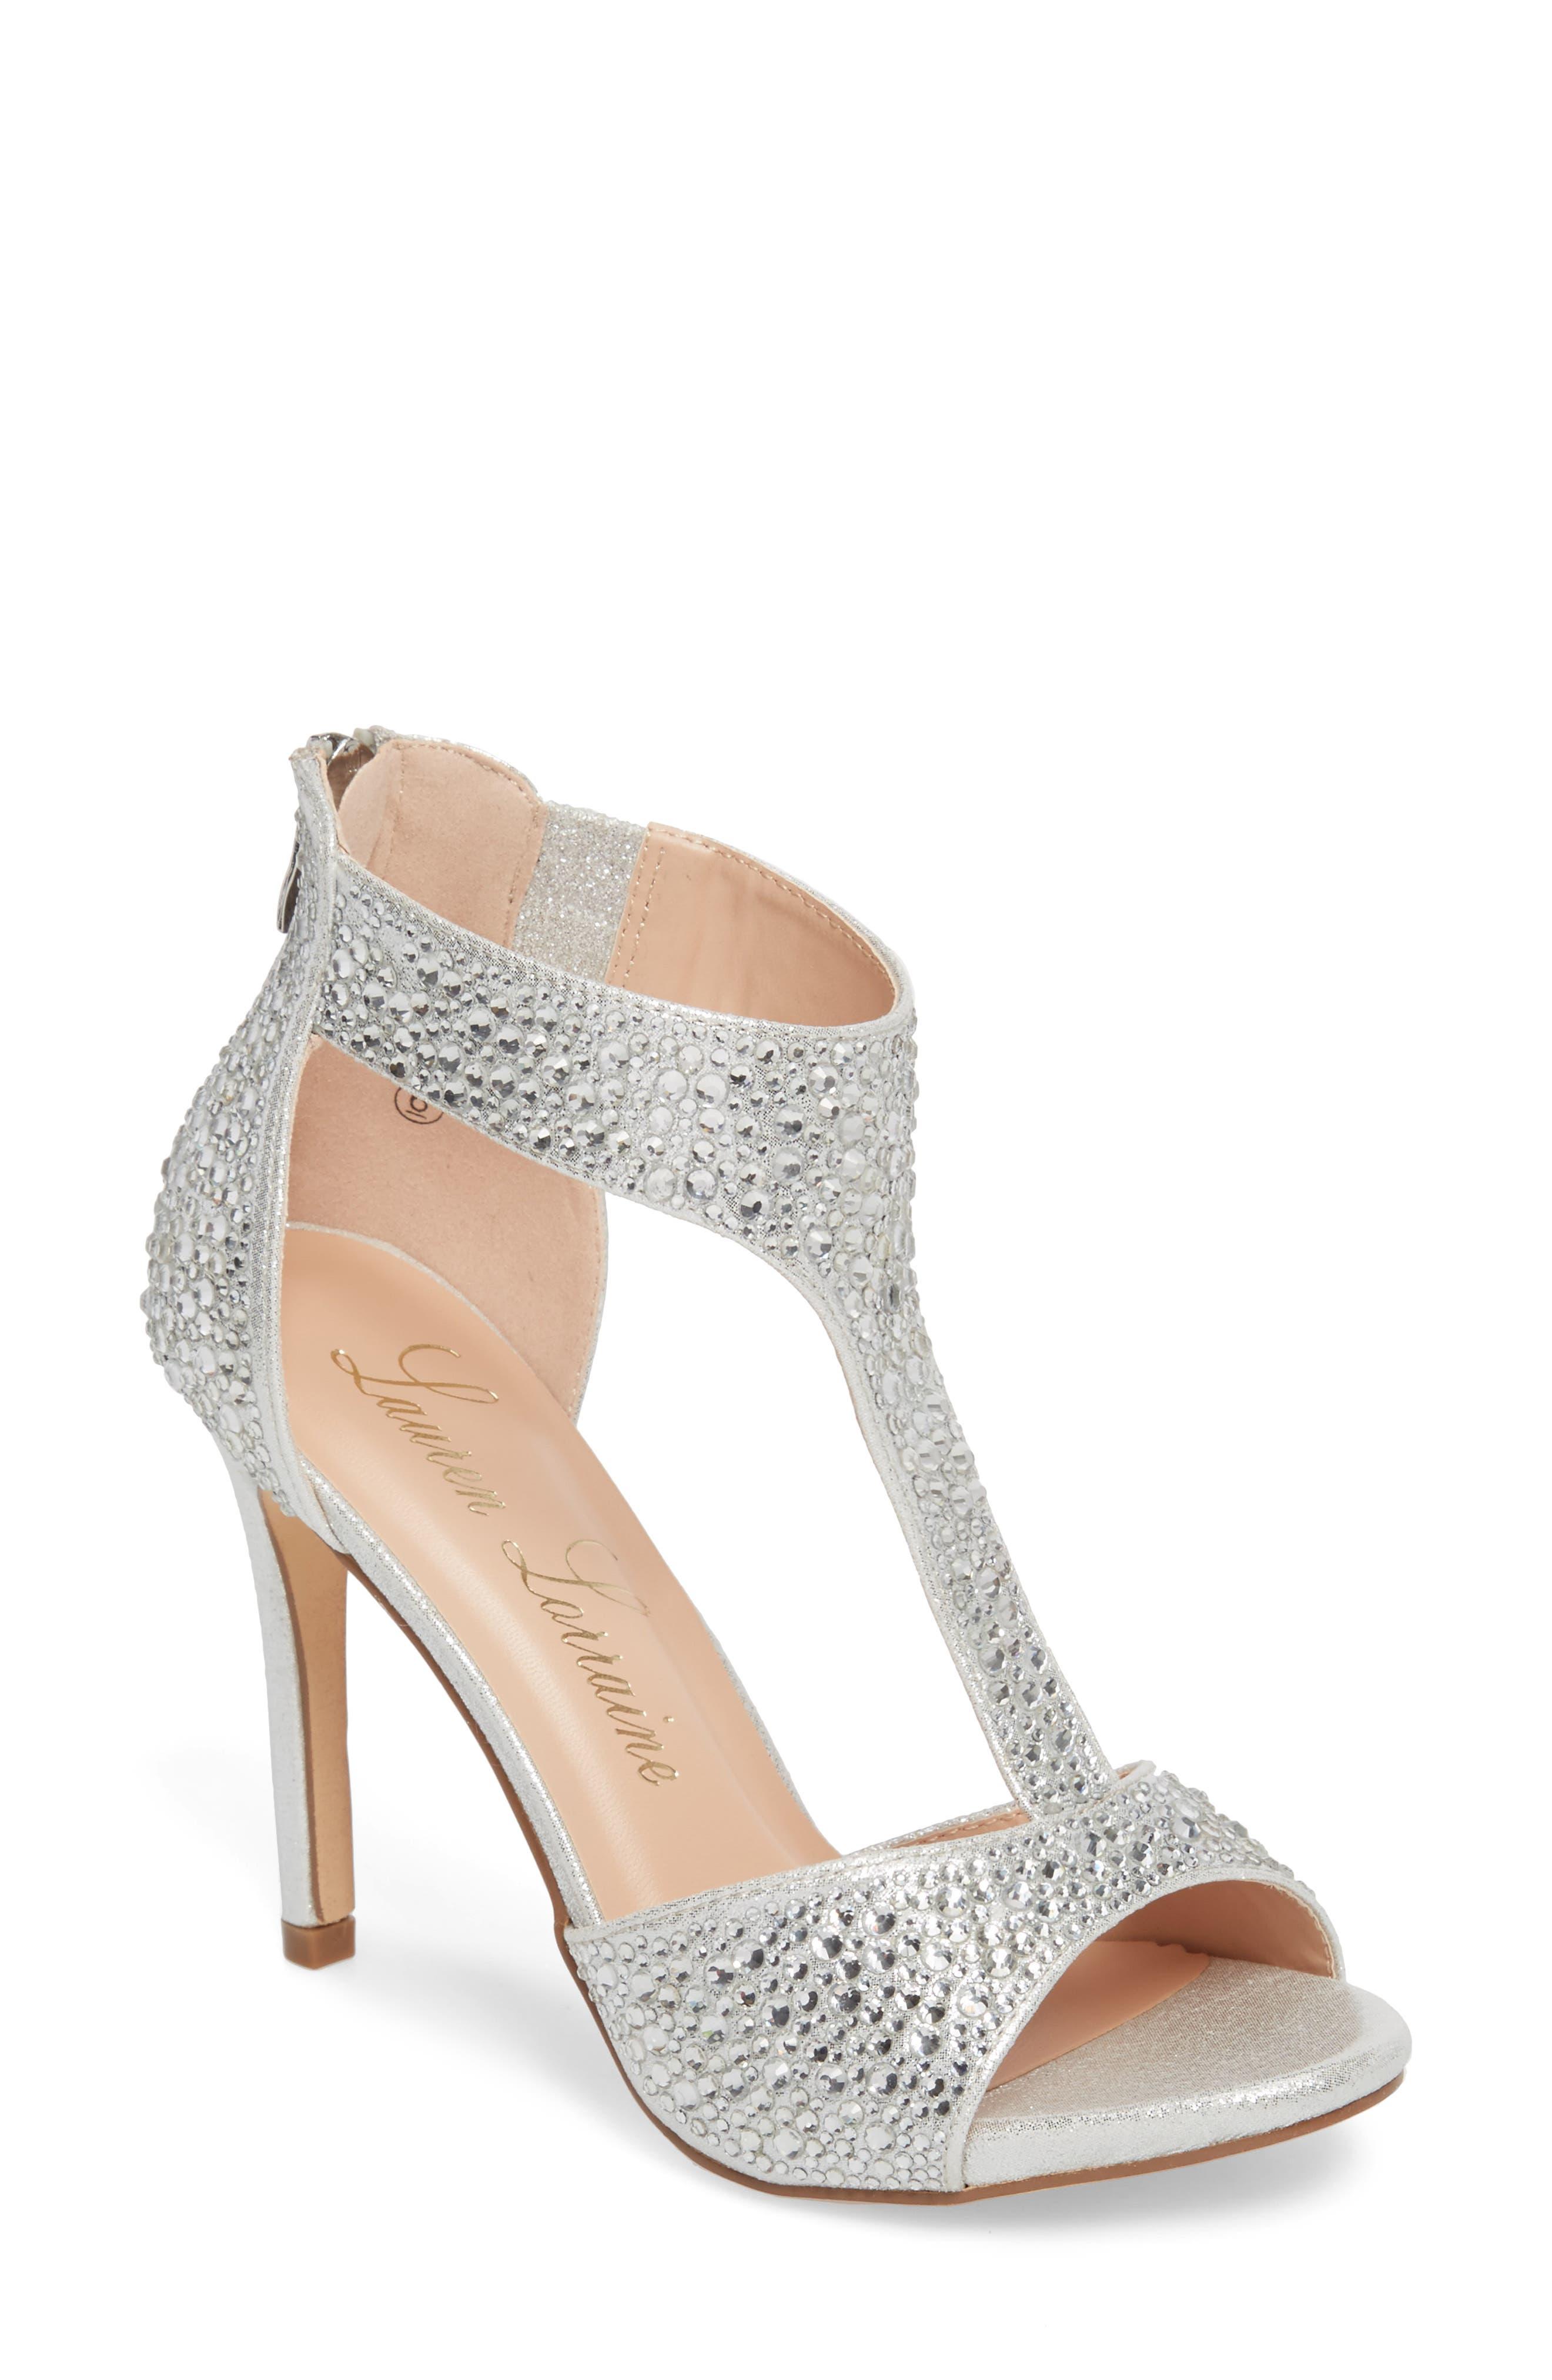 Lauren Lorraine Ina Crystal Embellished Sandal (Women)